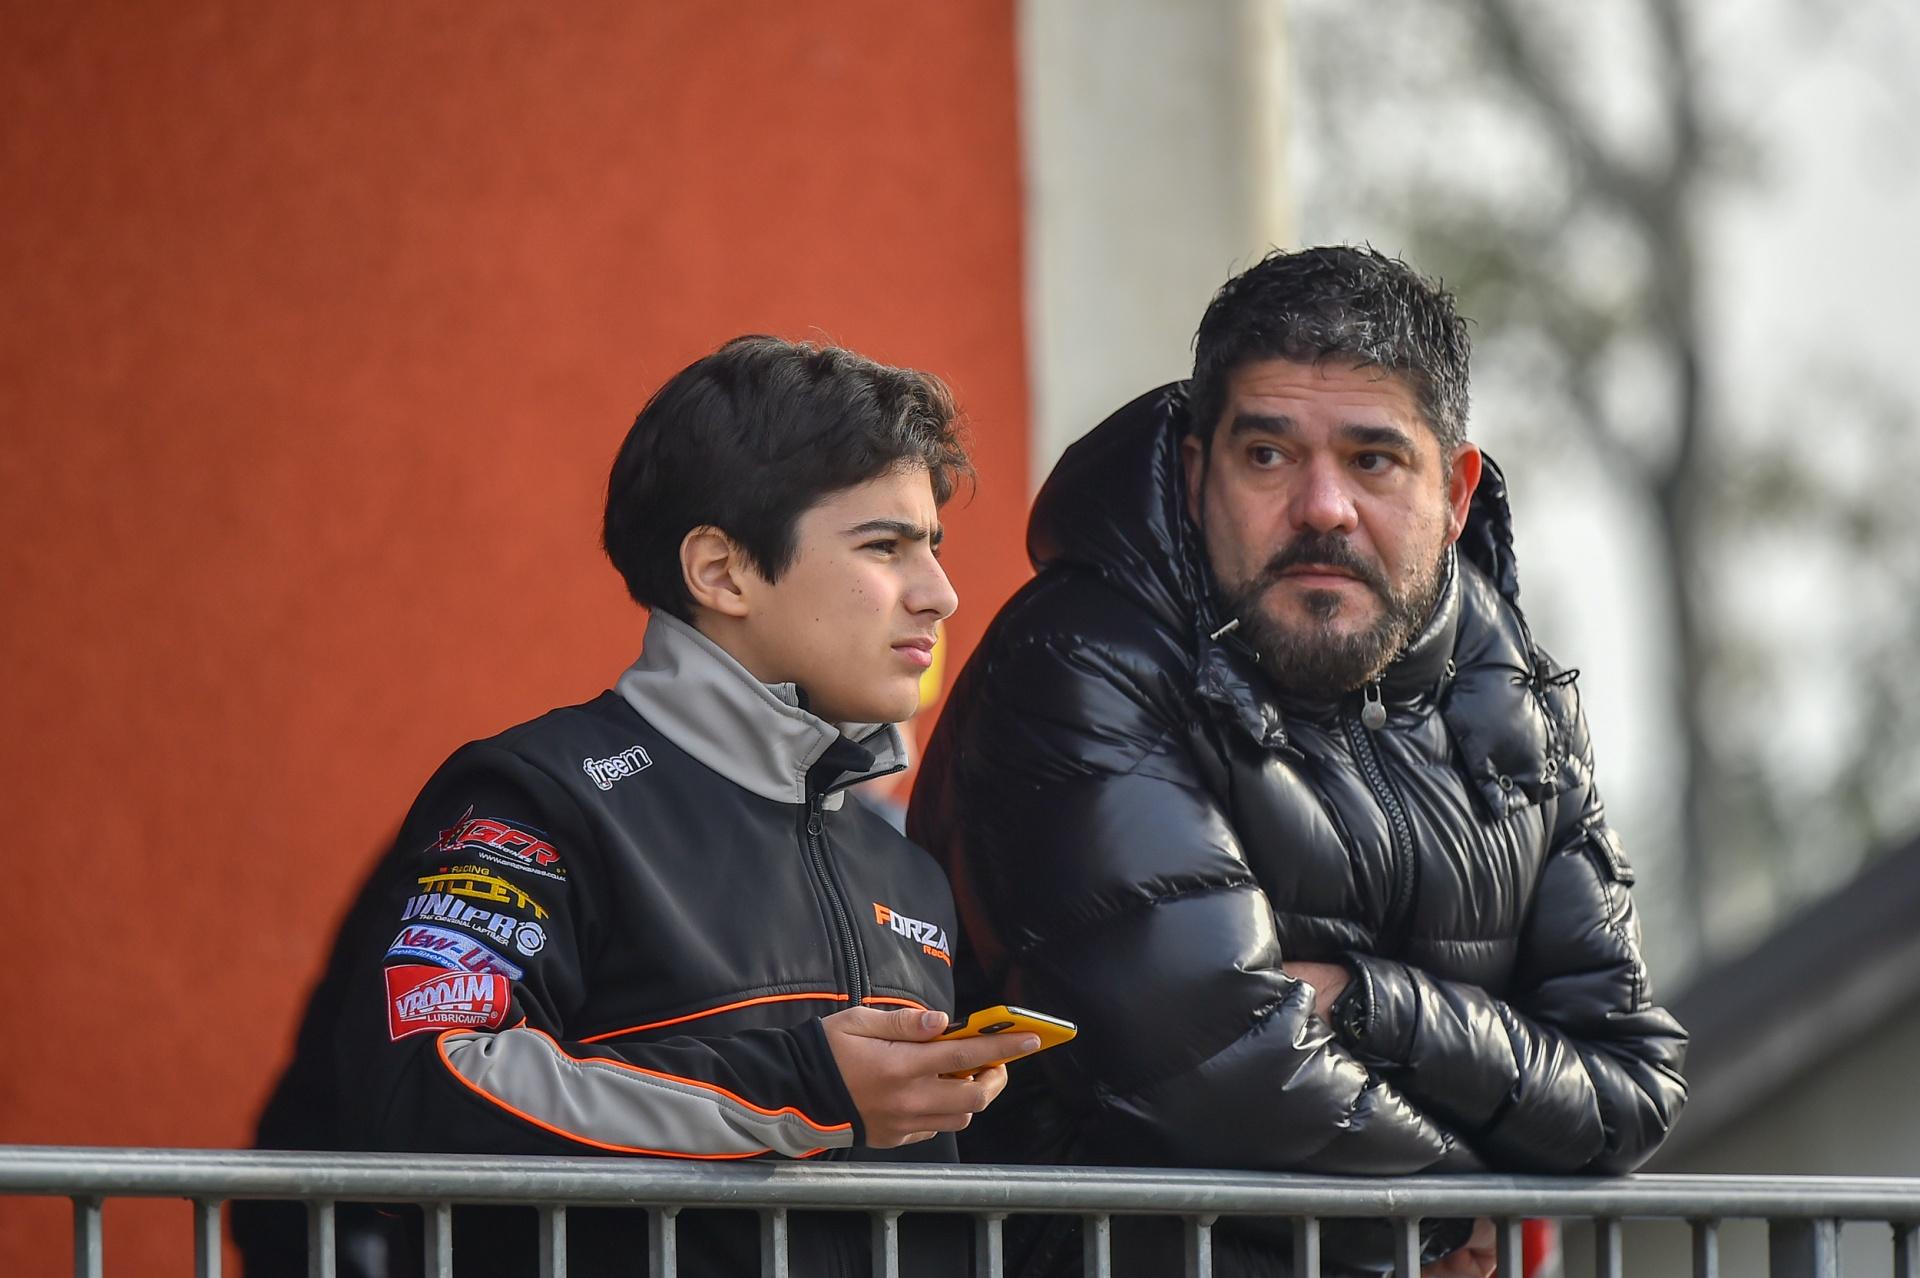 Rafael Camara and Forza Racing in attack-mode in Senior